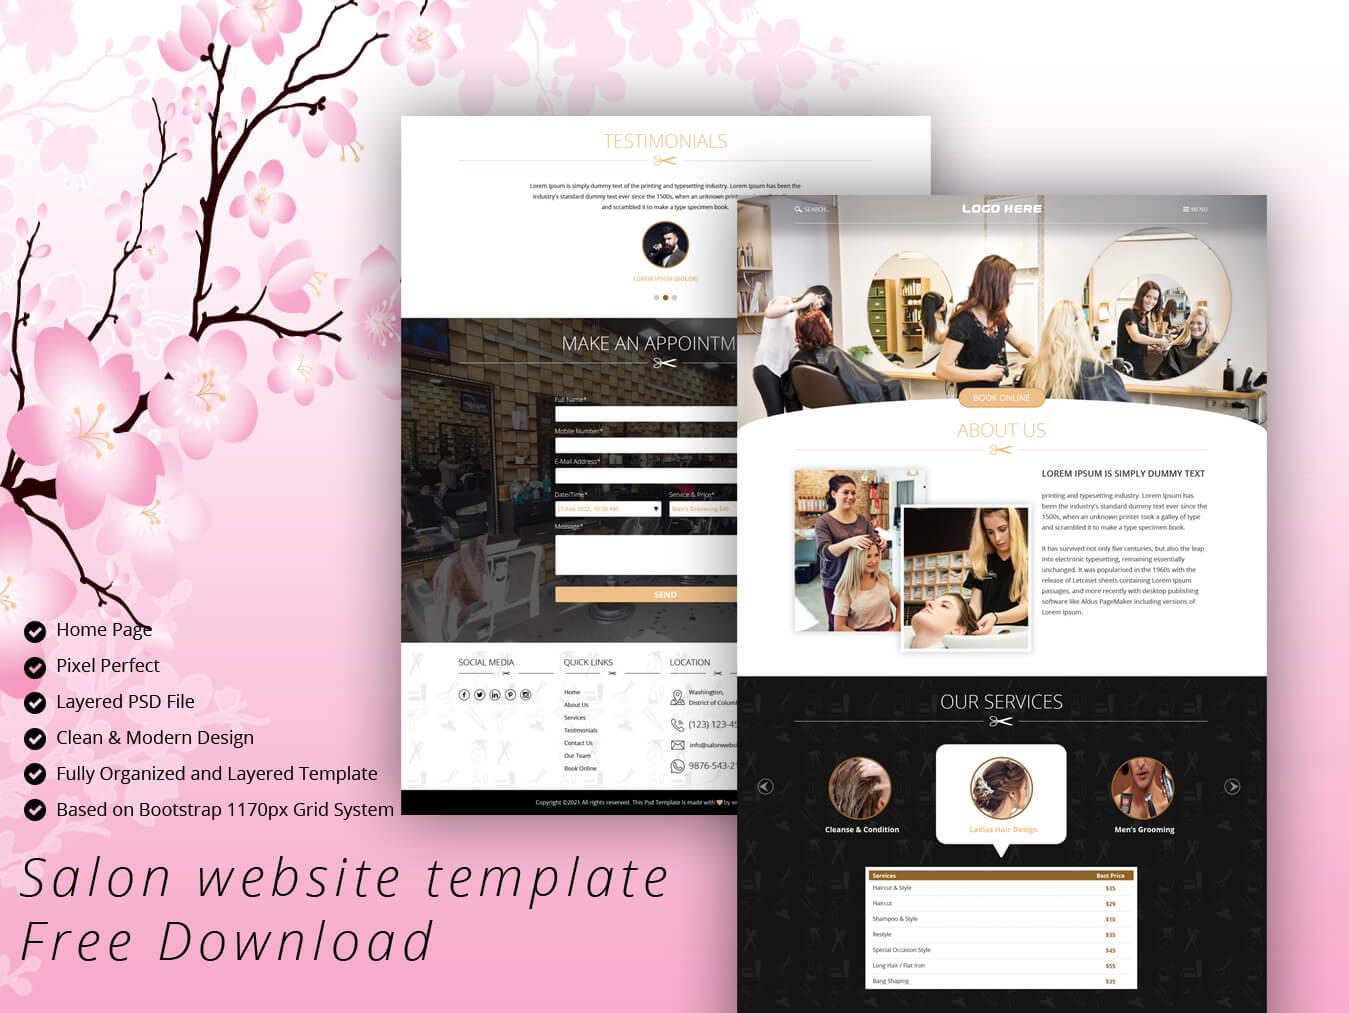 Salon website template Free Download